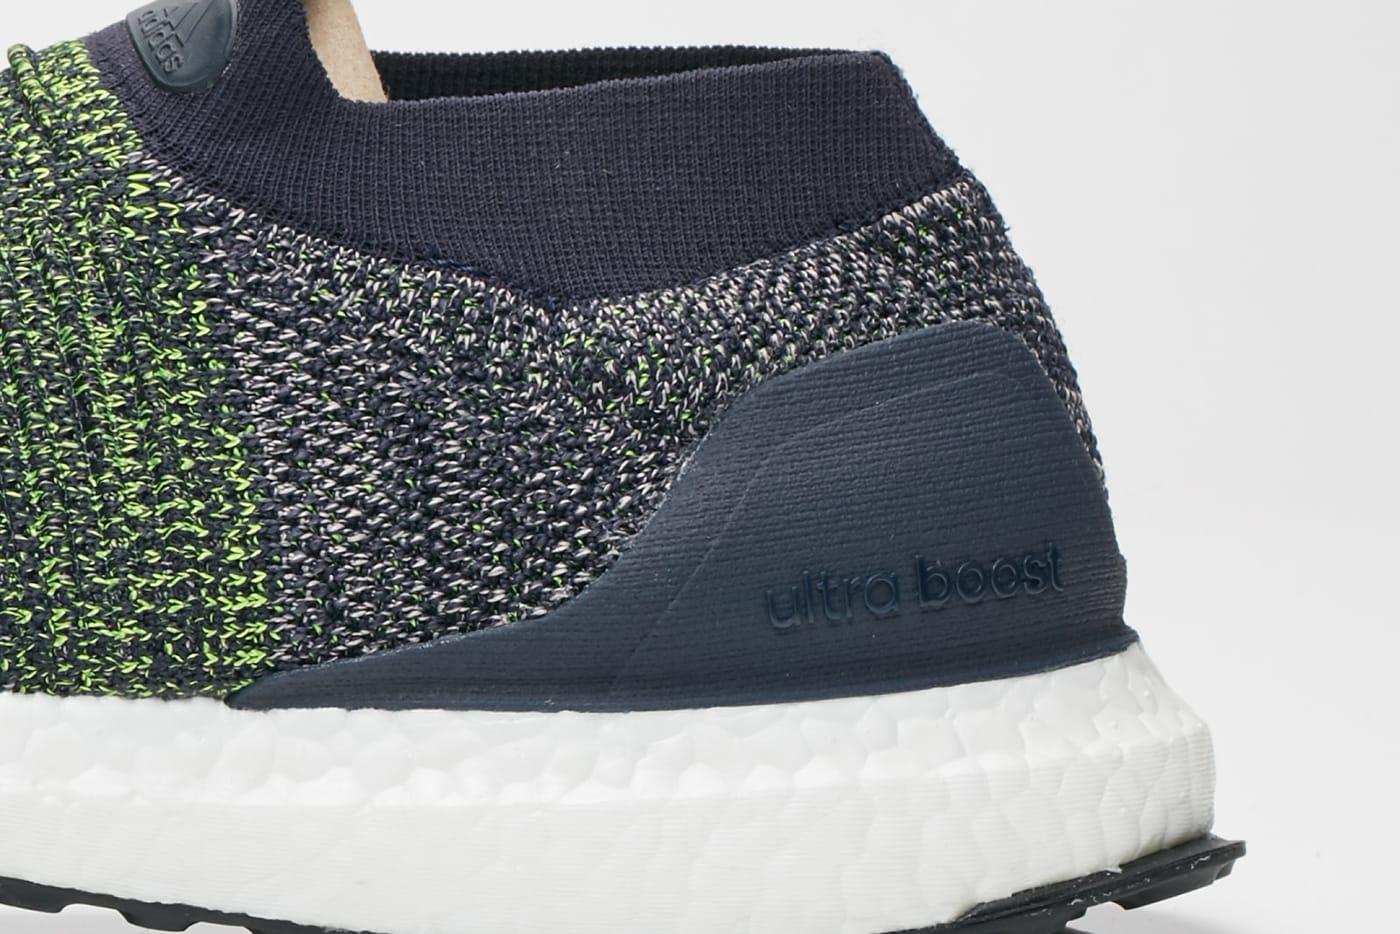 adidas Originals UltraBOOST Laceless